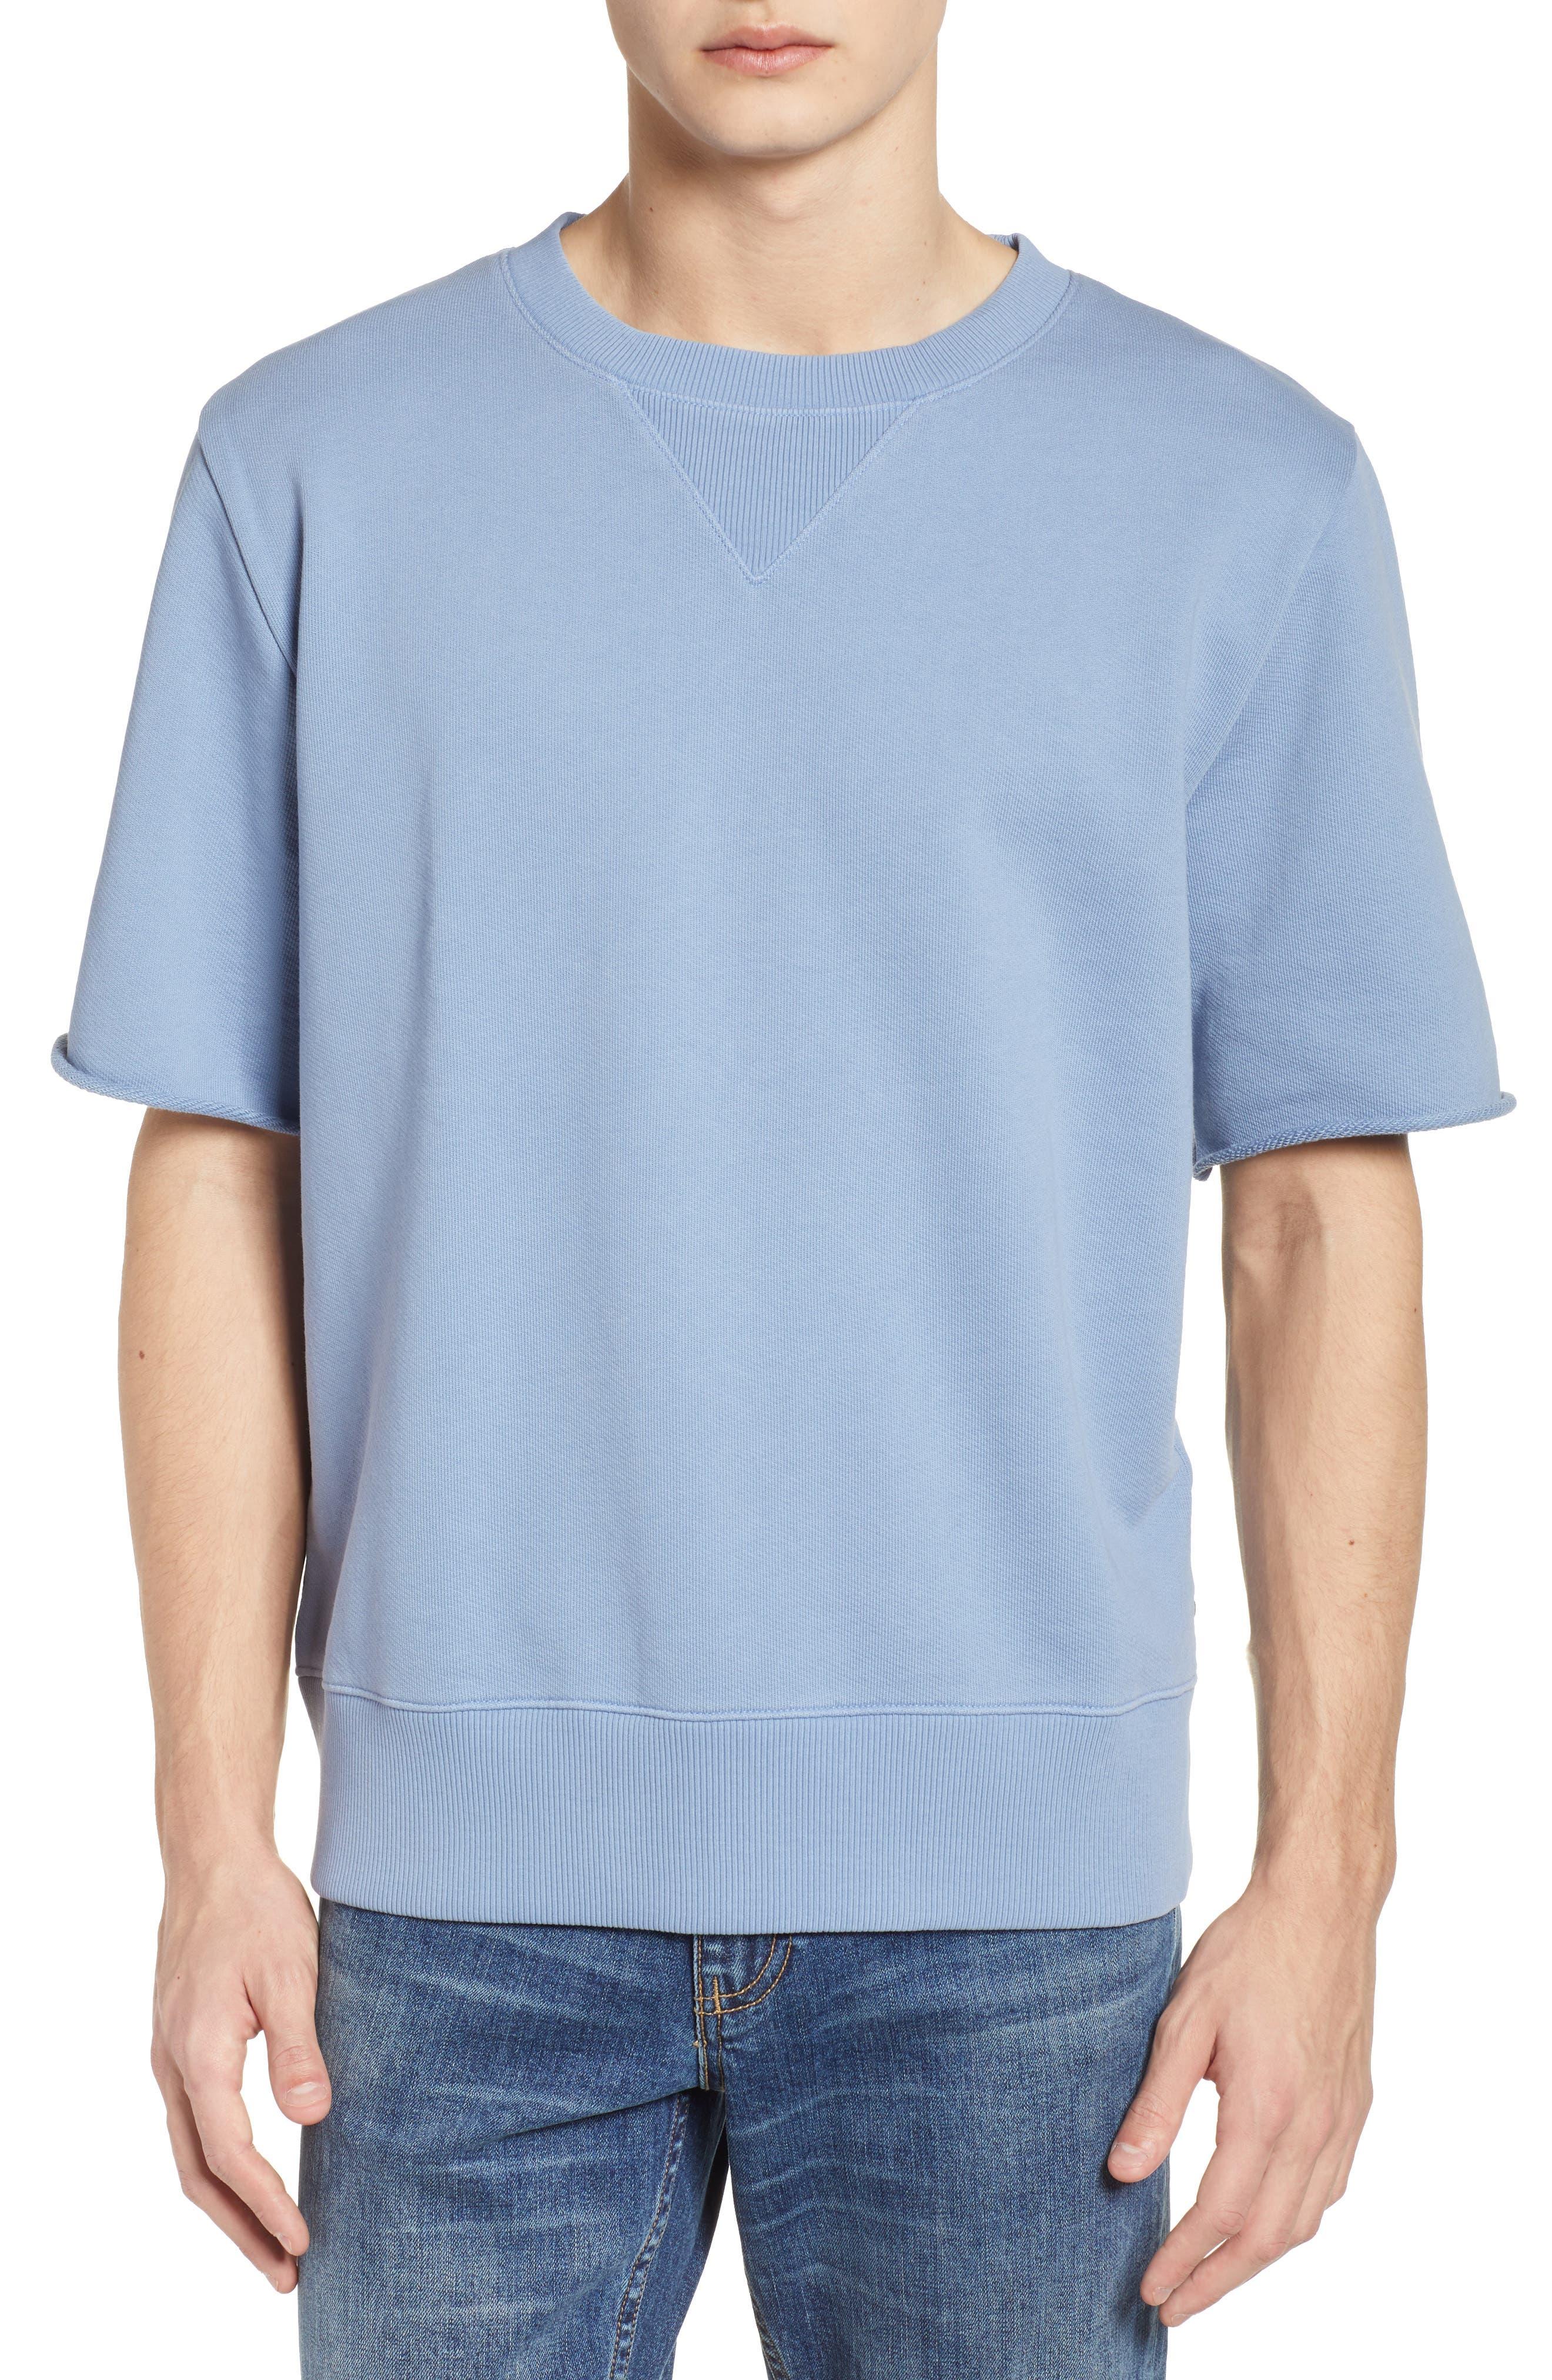 Cotton Terry Sweatshirt,                         Main,                         color,